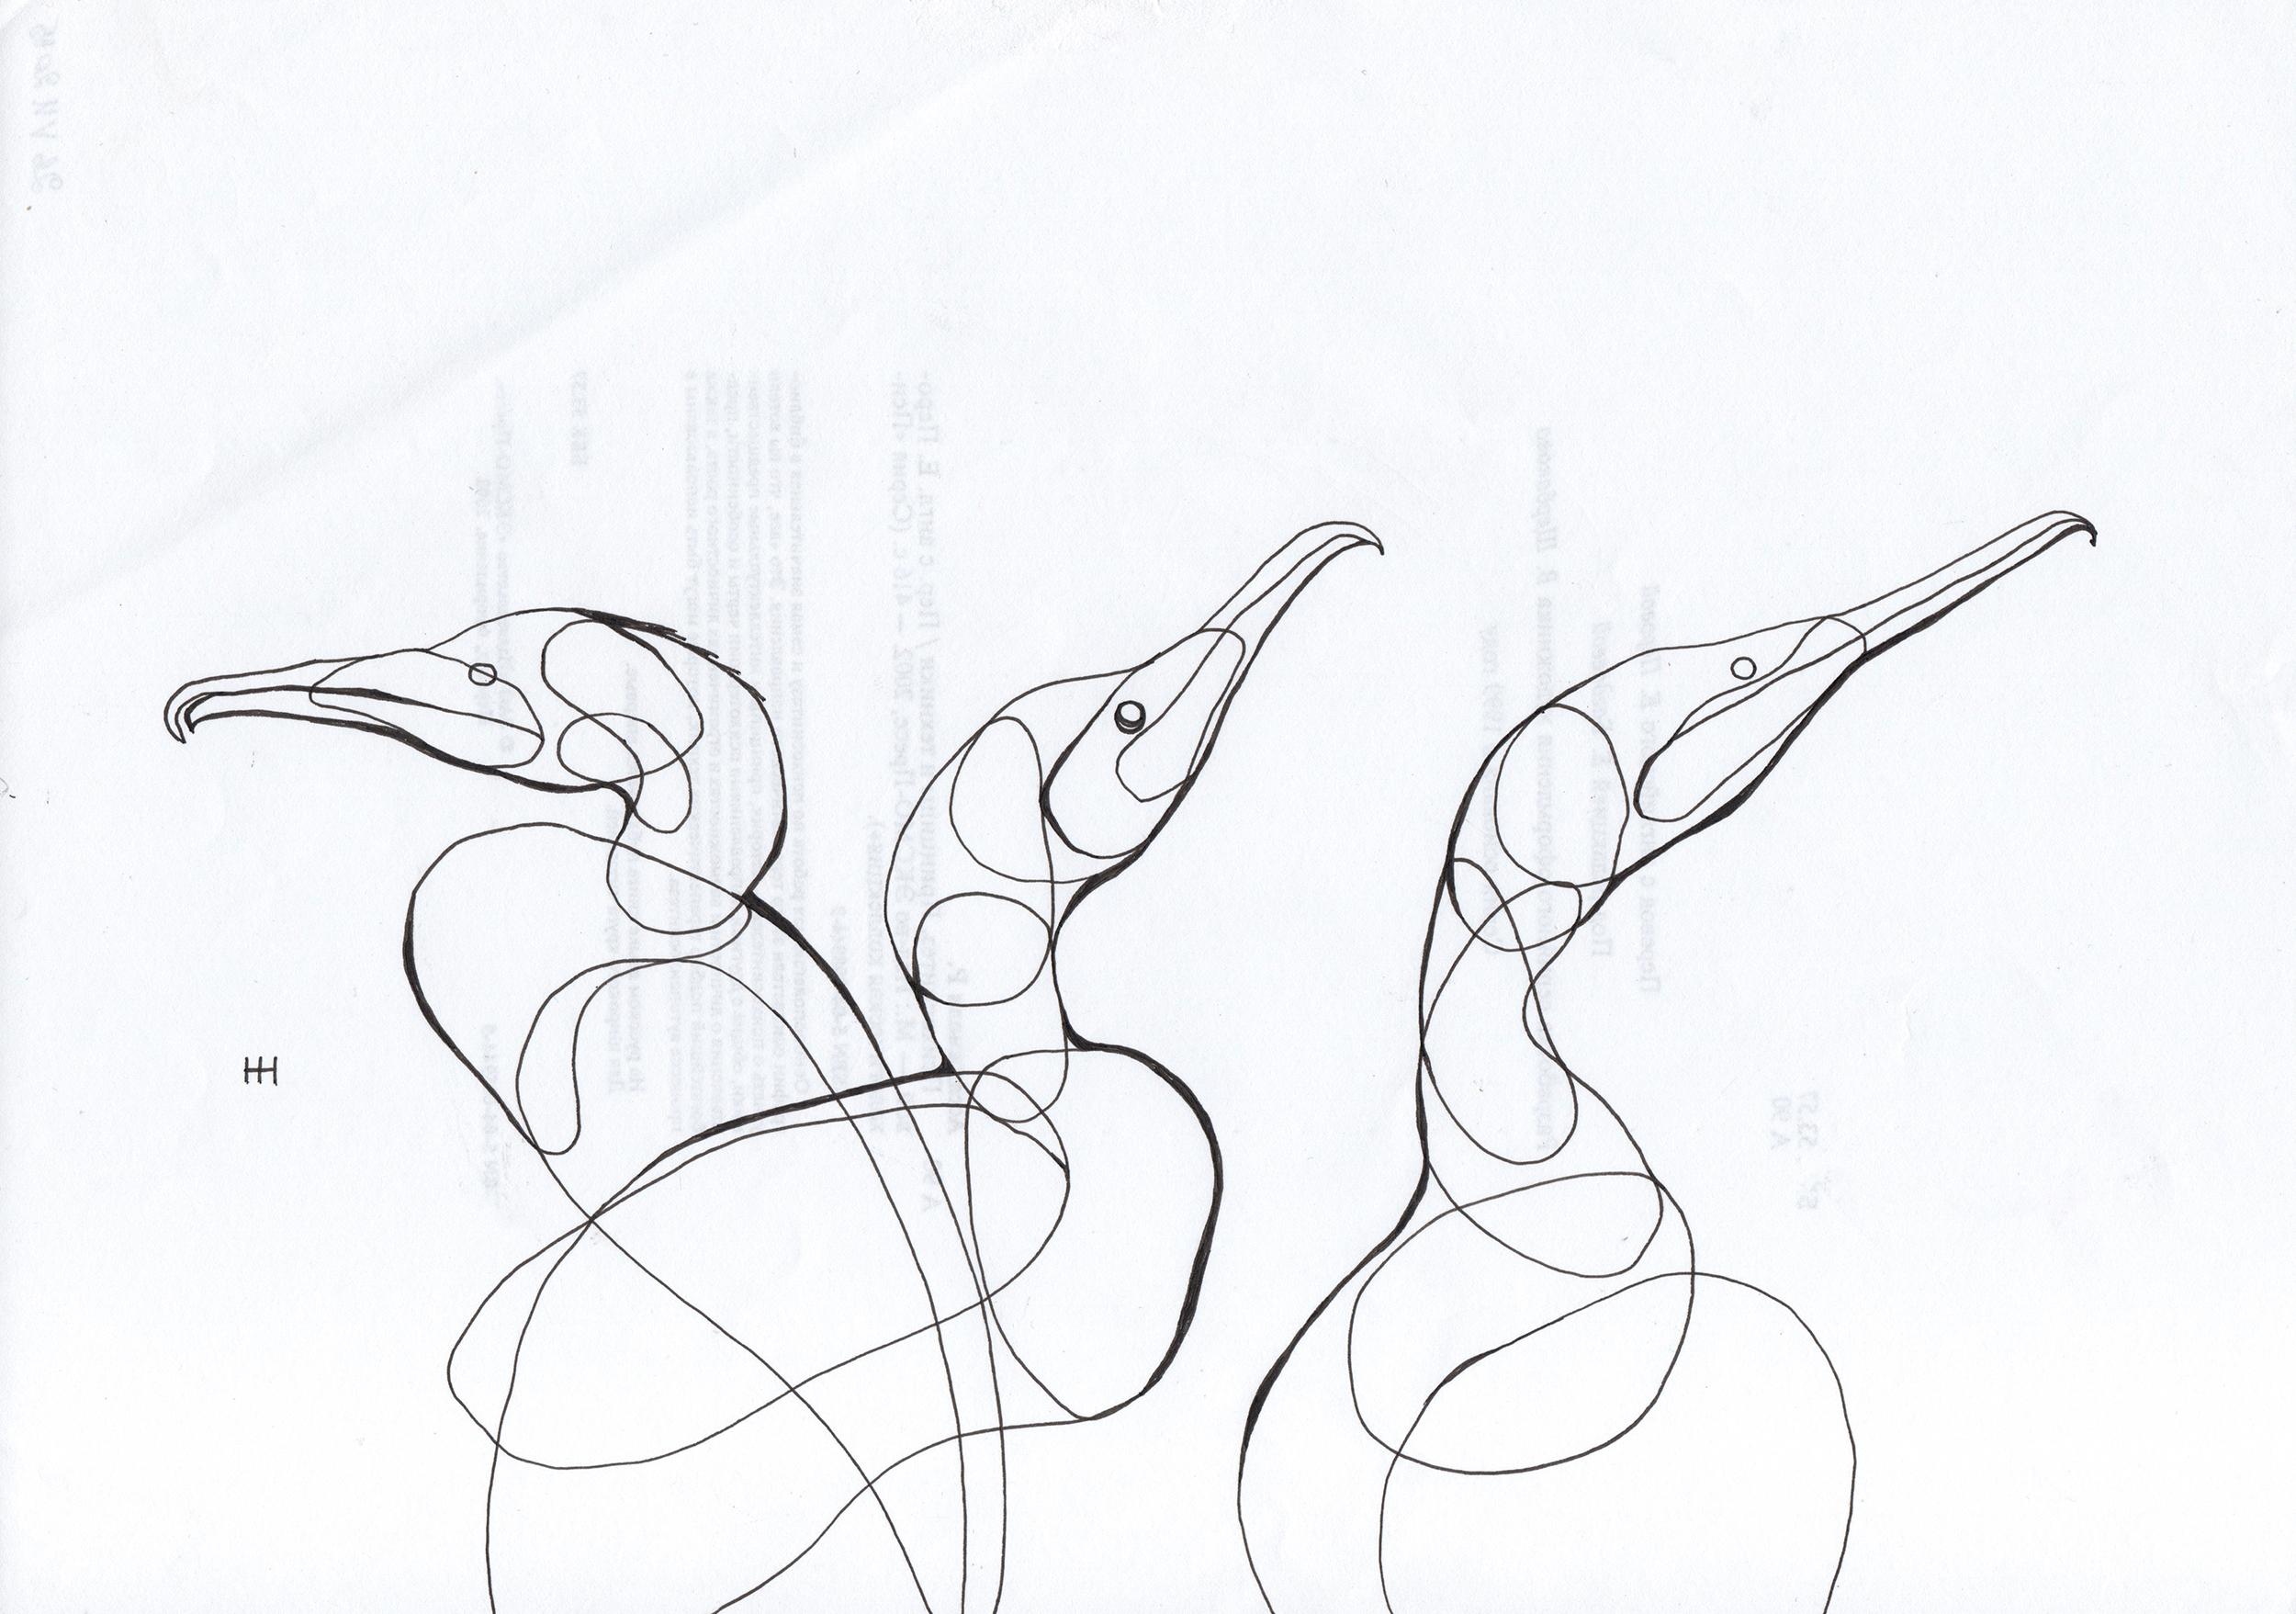 PticyLinejnye_0 26.jpg